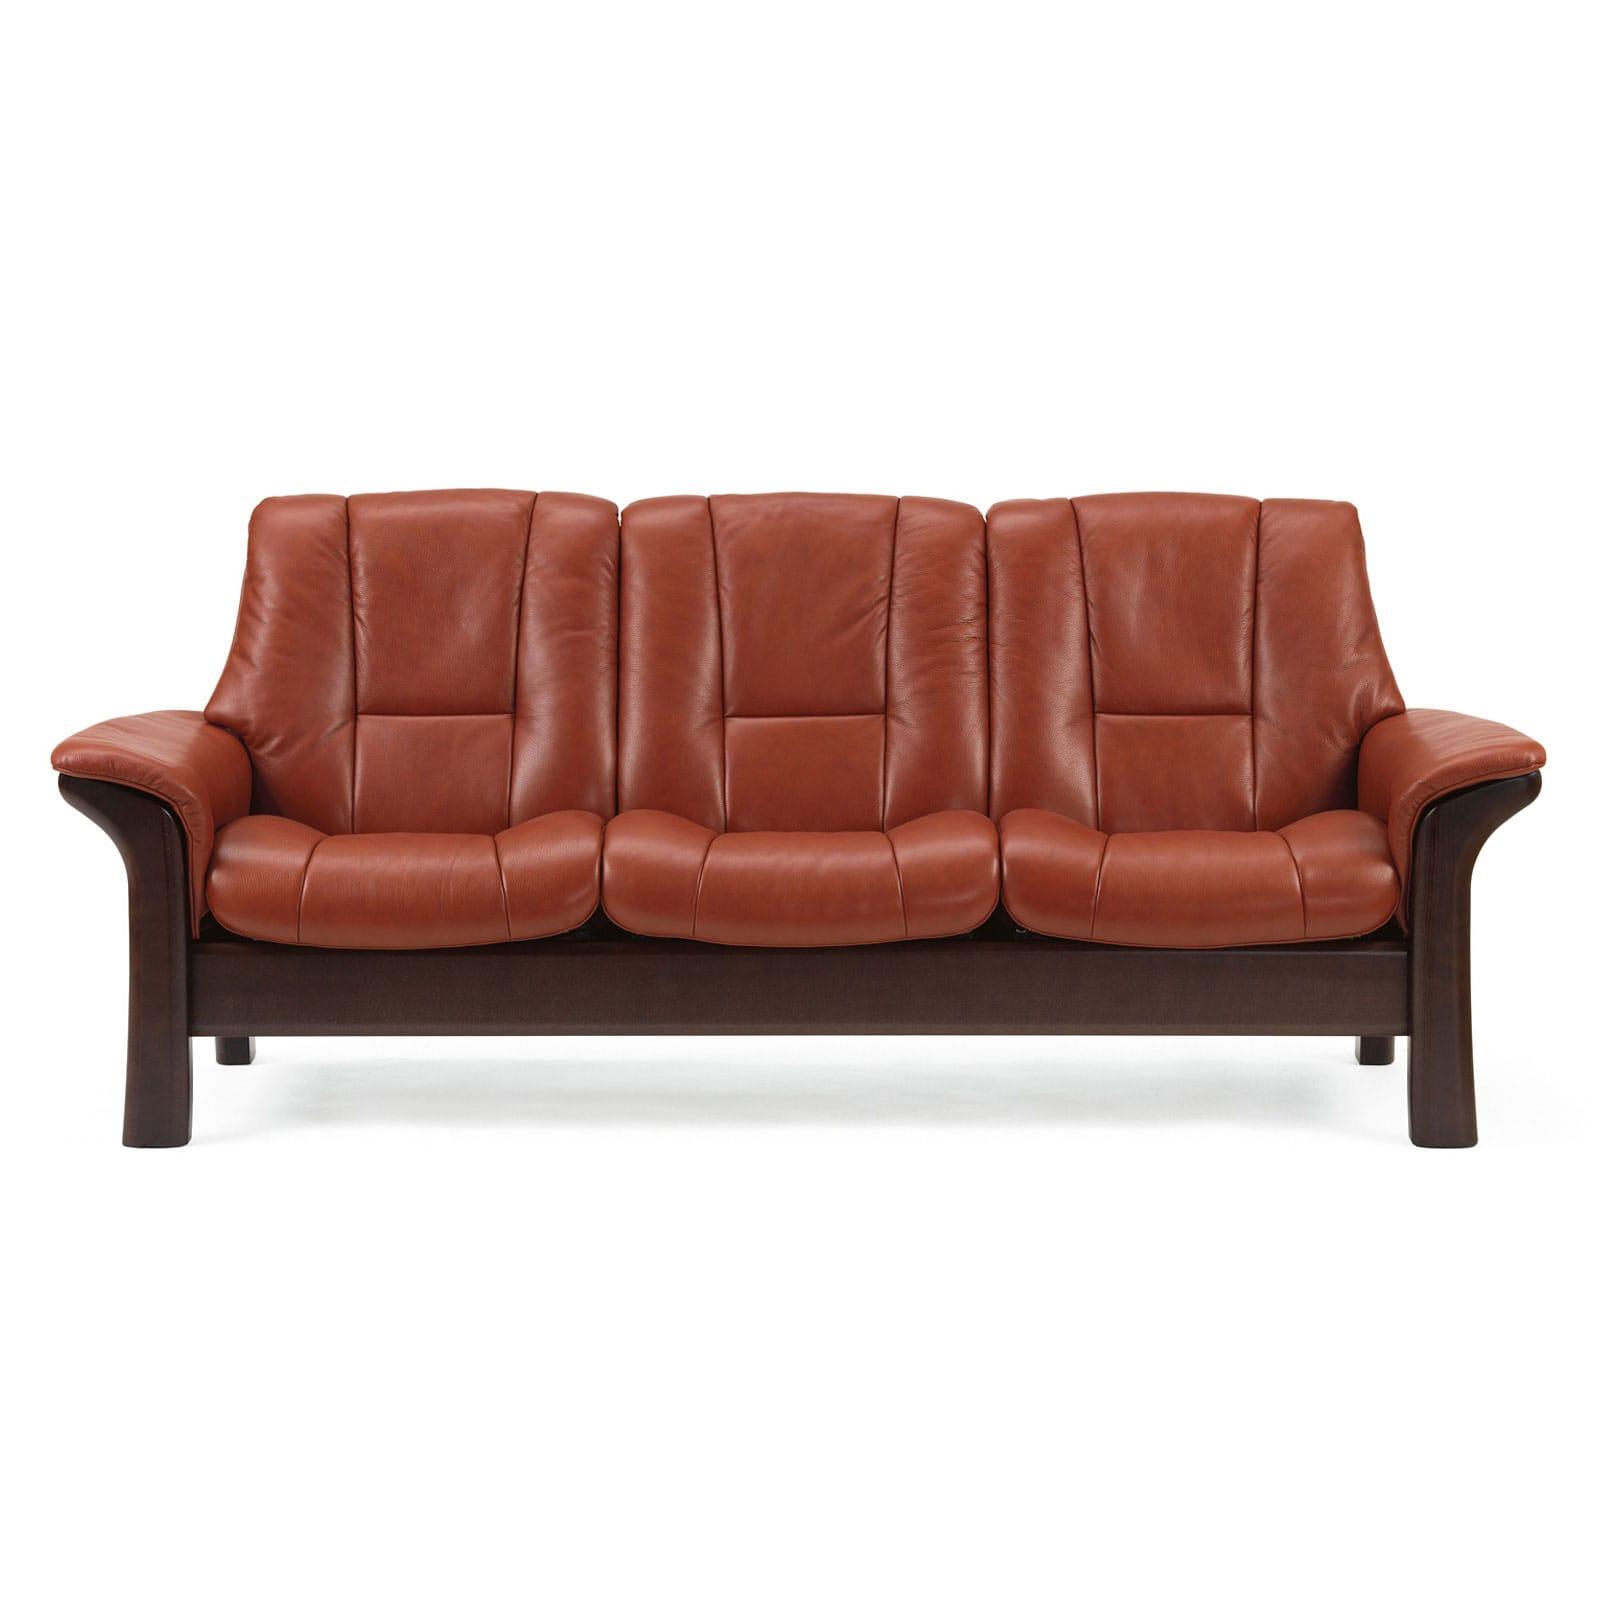 Full Size of Stressless Sofa Australia Uk Furniture Usa Canada 2 Seater Leather Manhattan Review Windsor M 3 Sitzer In Leder Paloma Copper 1 Husse Chippendale Lederpflege Sofa Stressless Sofa